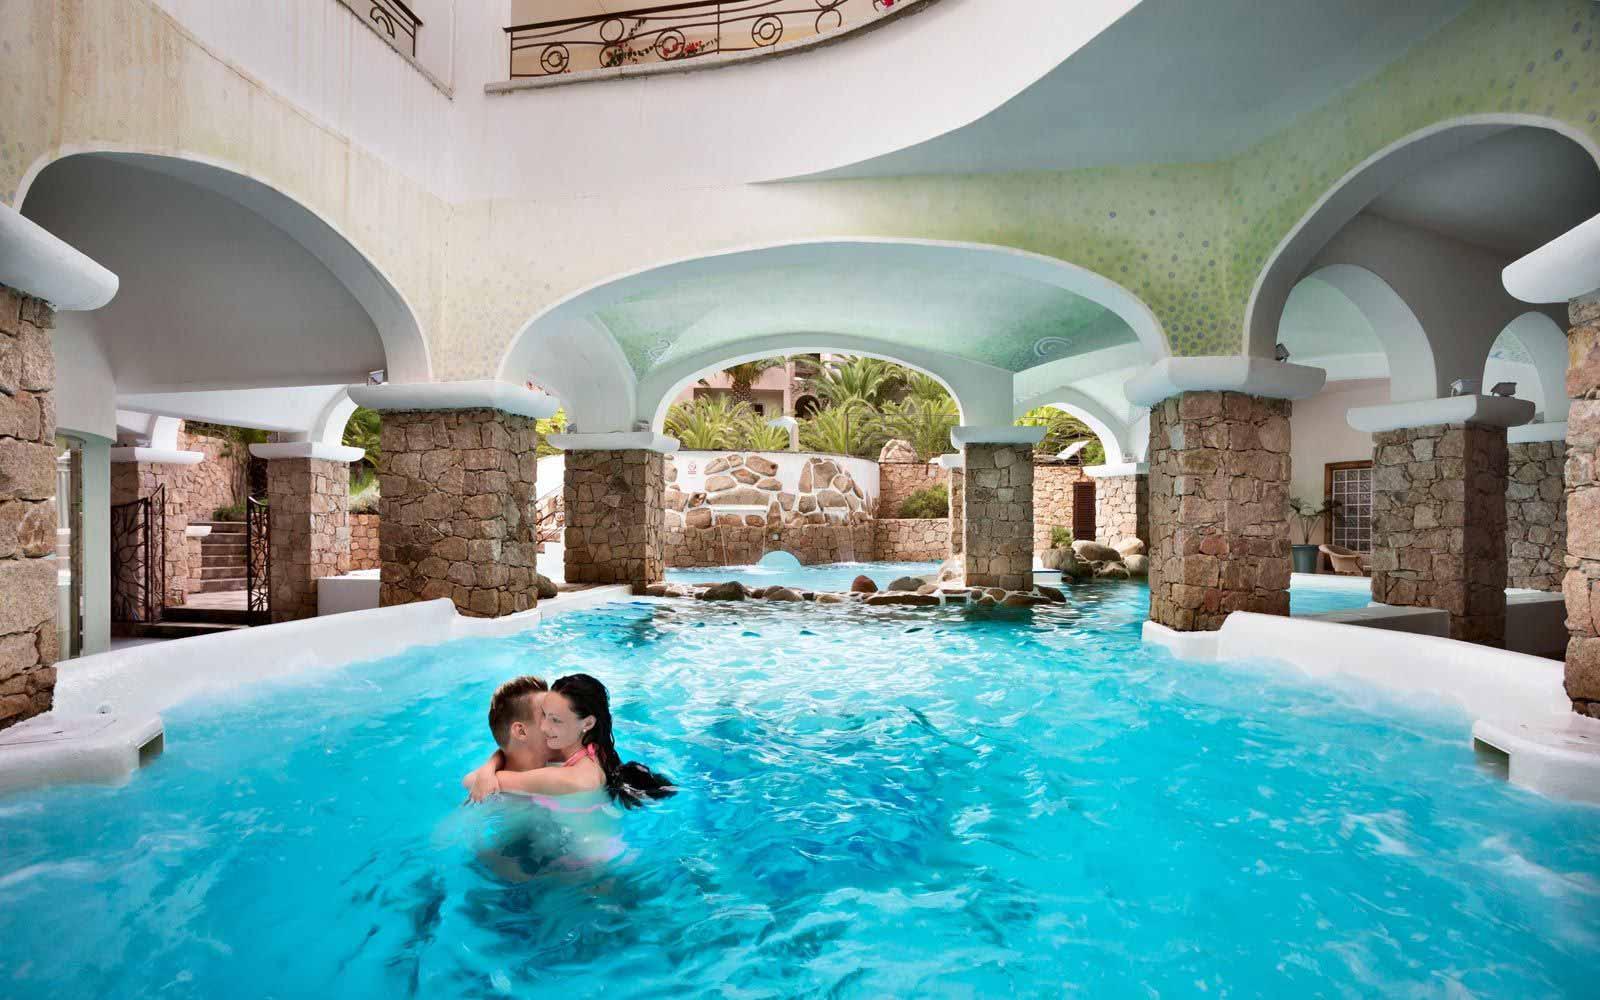 Thalasso Pool at Hotel Relax Torreruja Thalasso & Spa